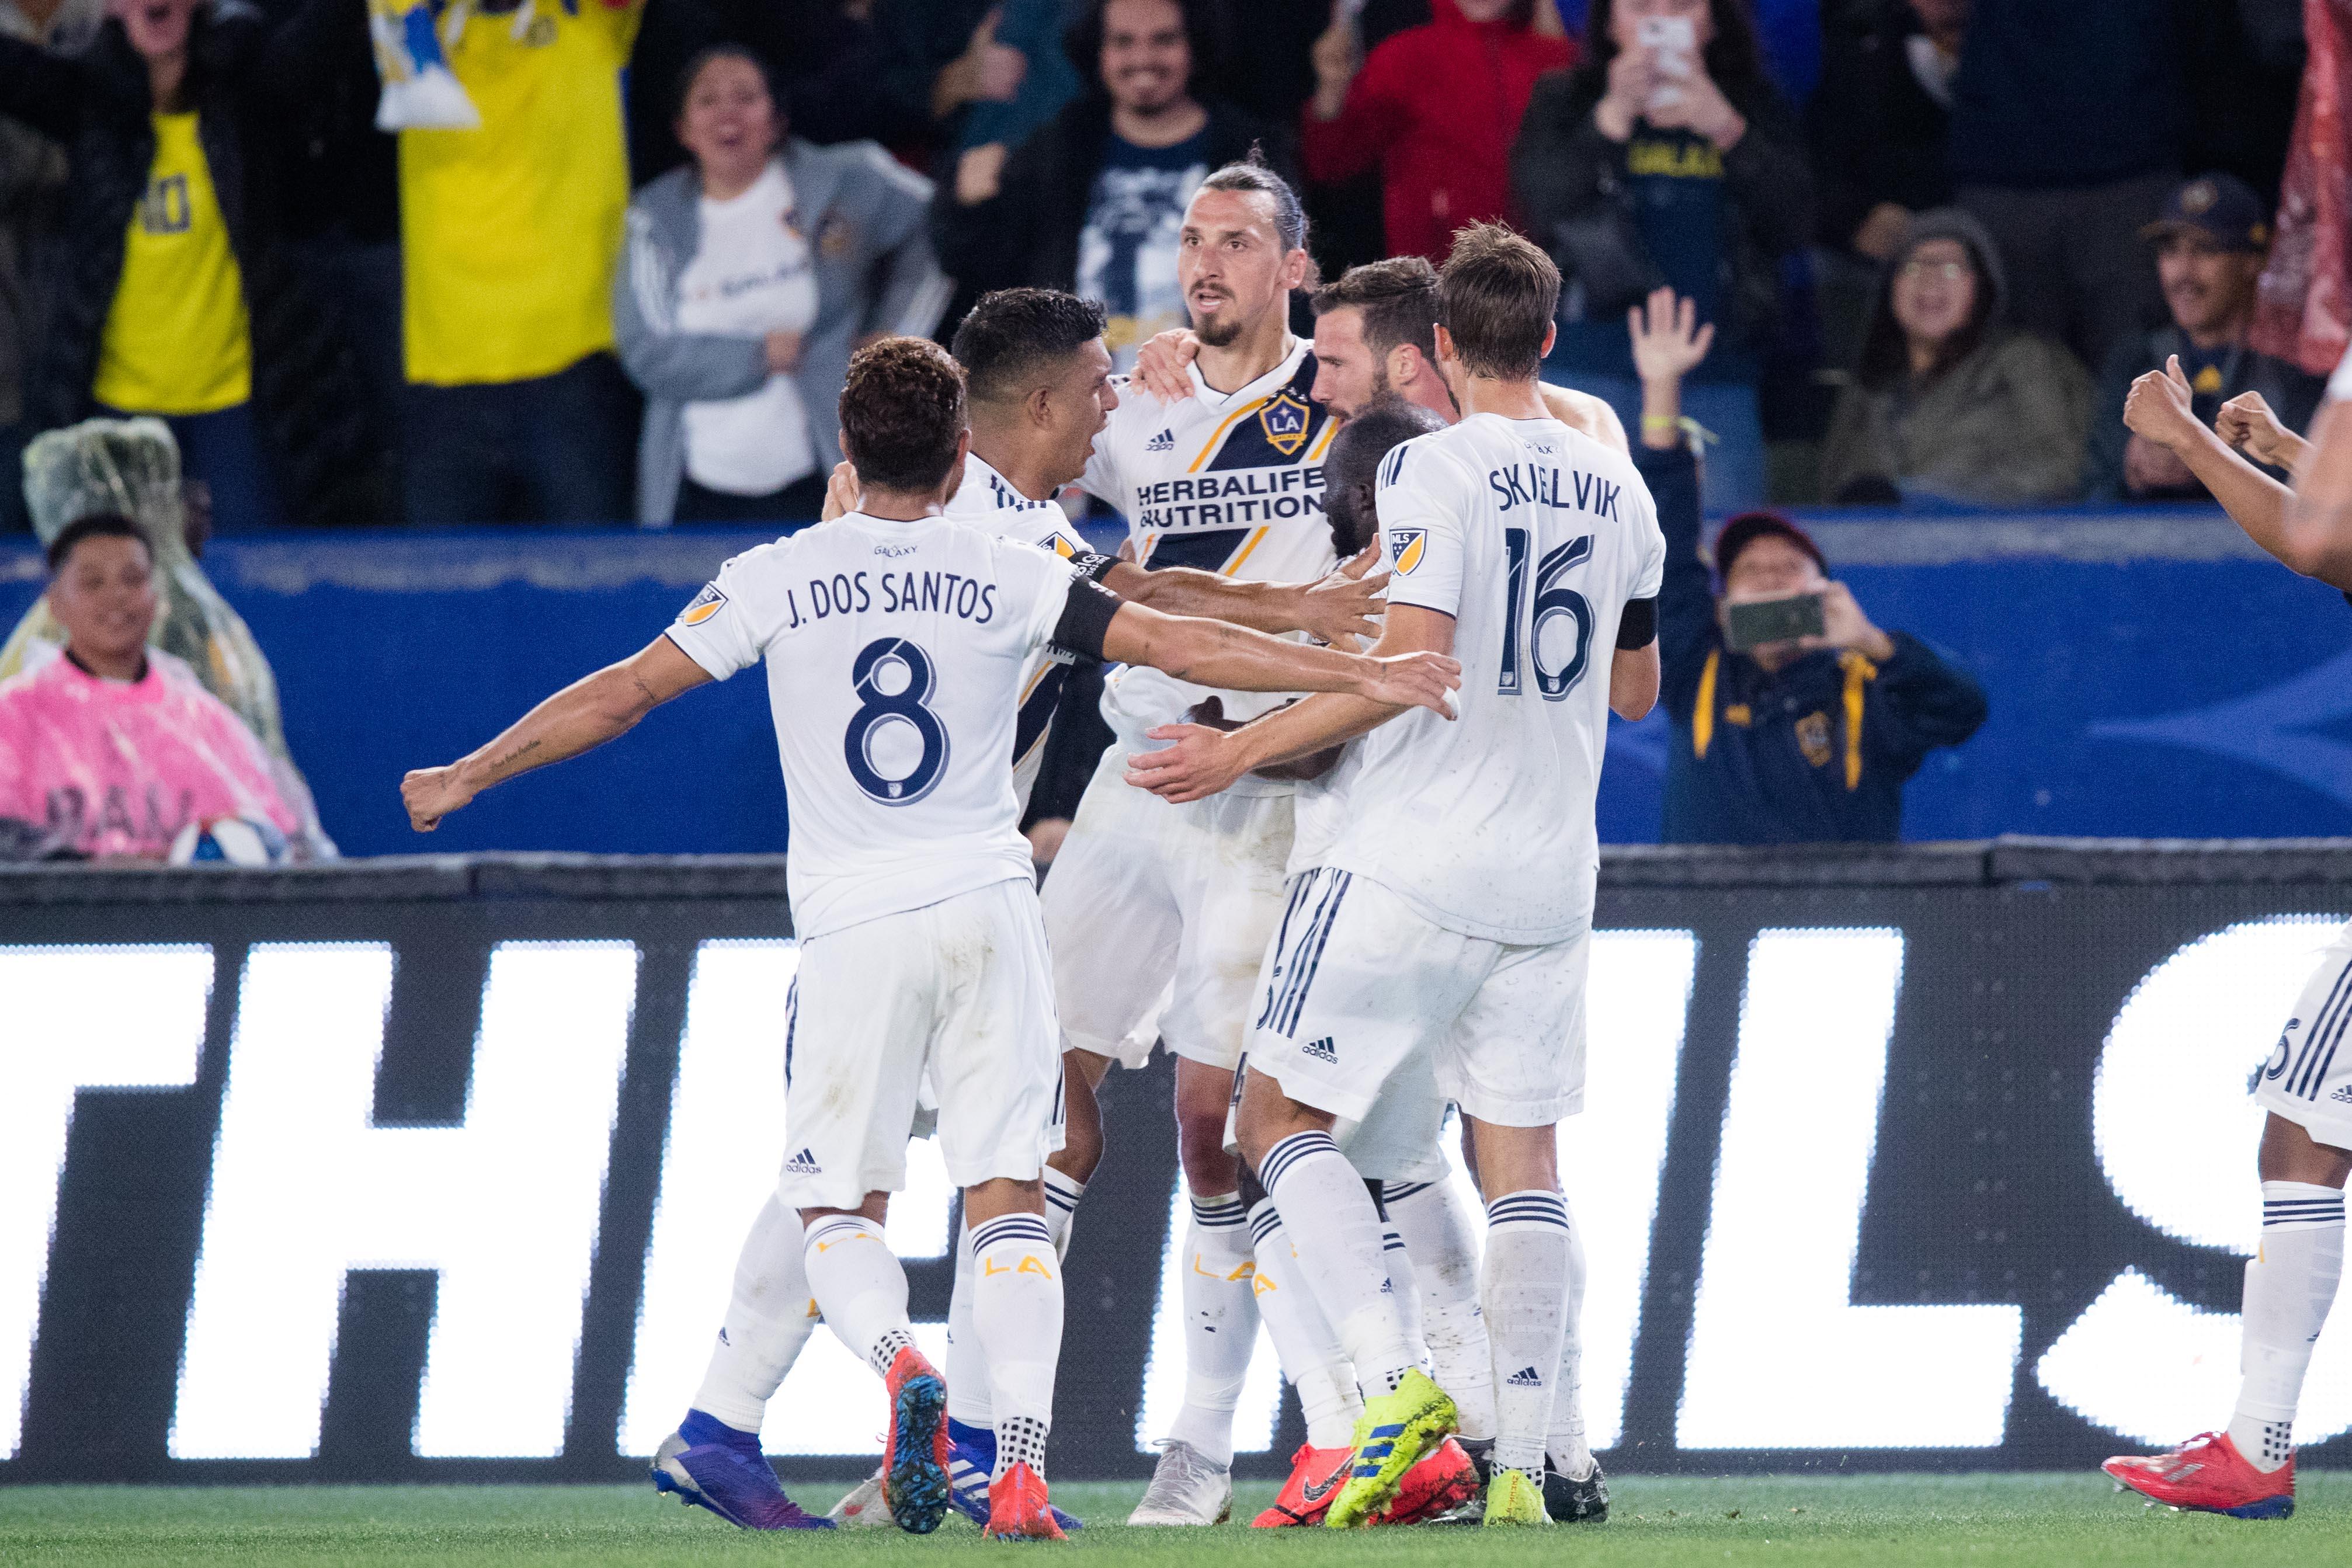 2019 Season: LA Galaxy Game